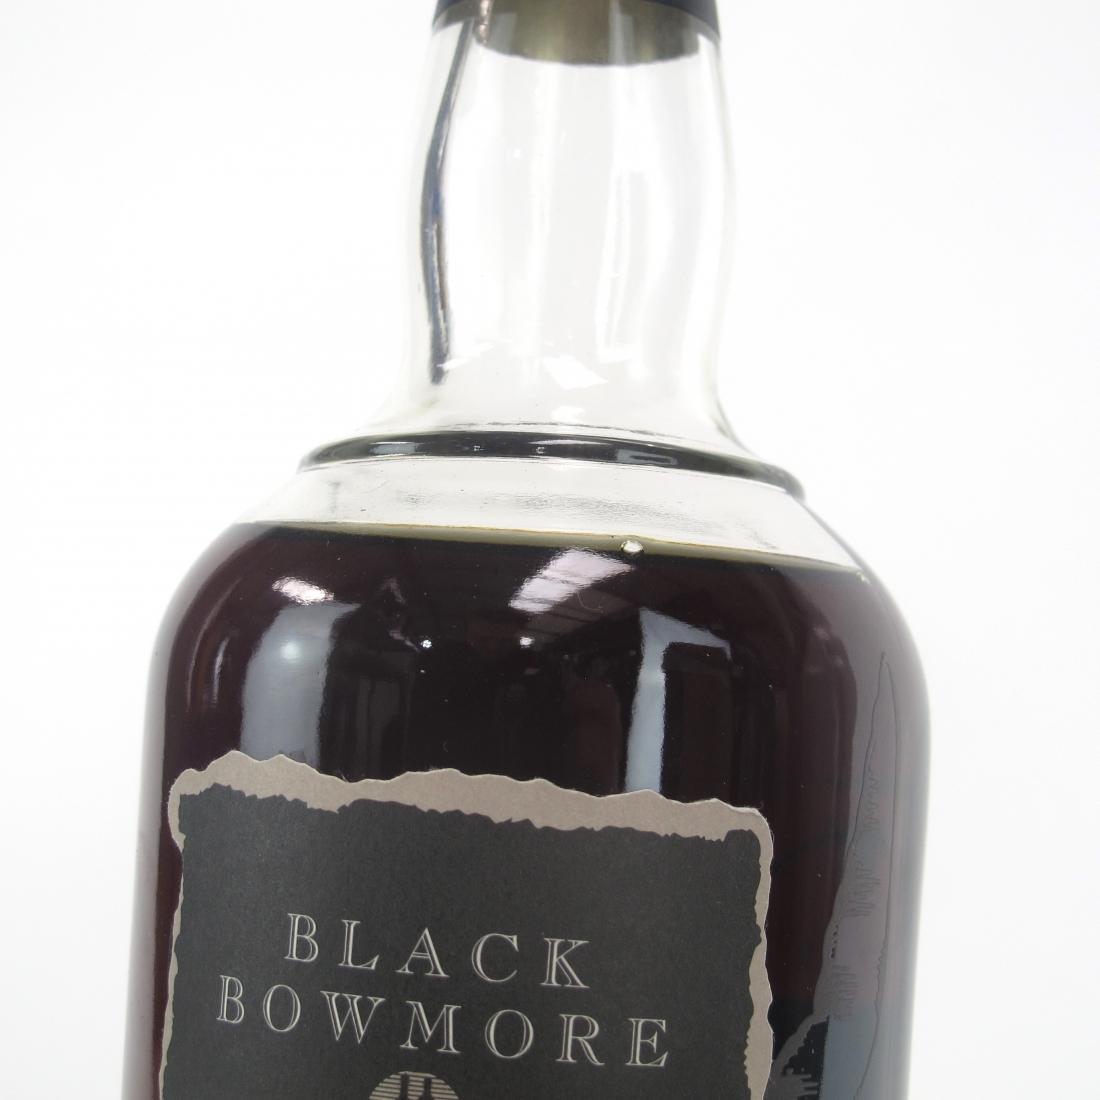 Bowmore 1964 'Black Bowmore' Final Edition